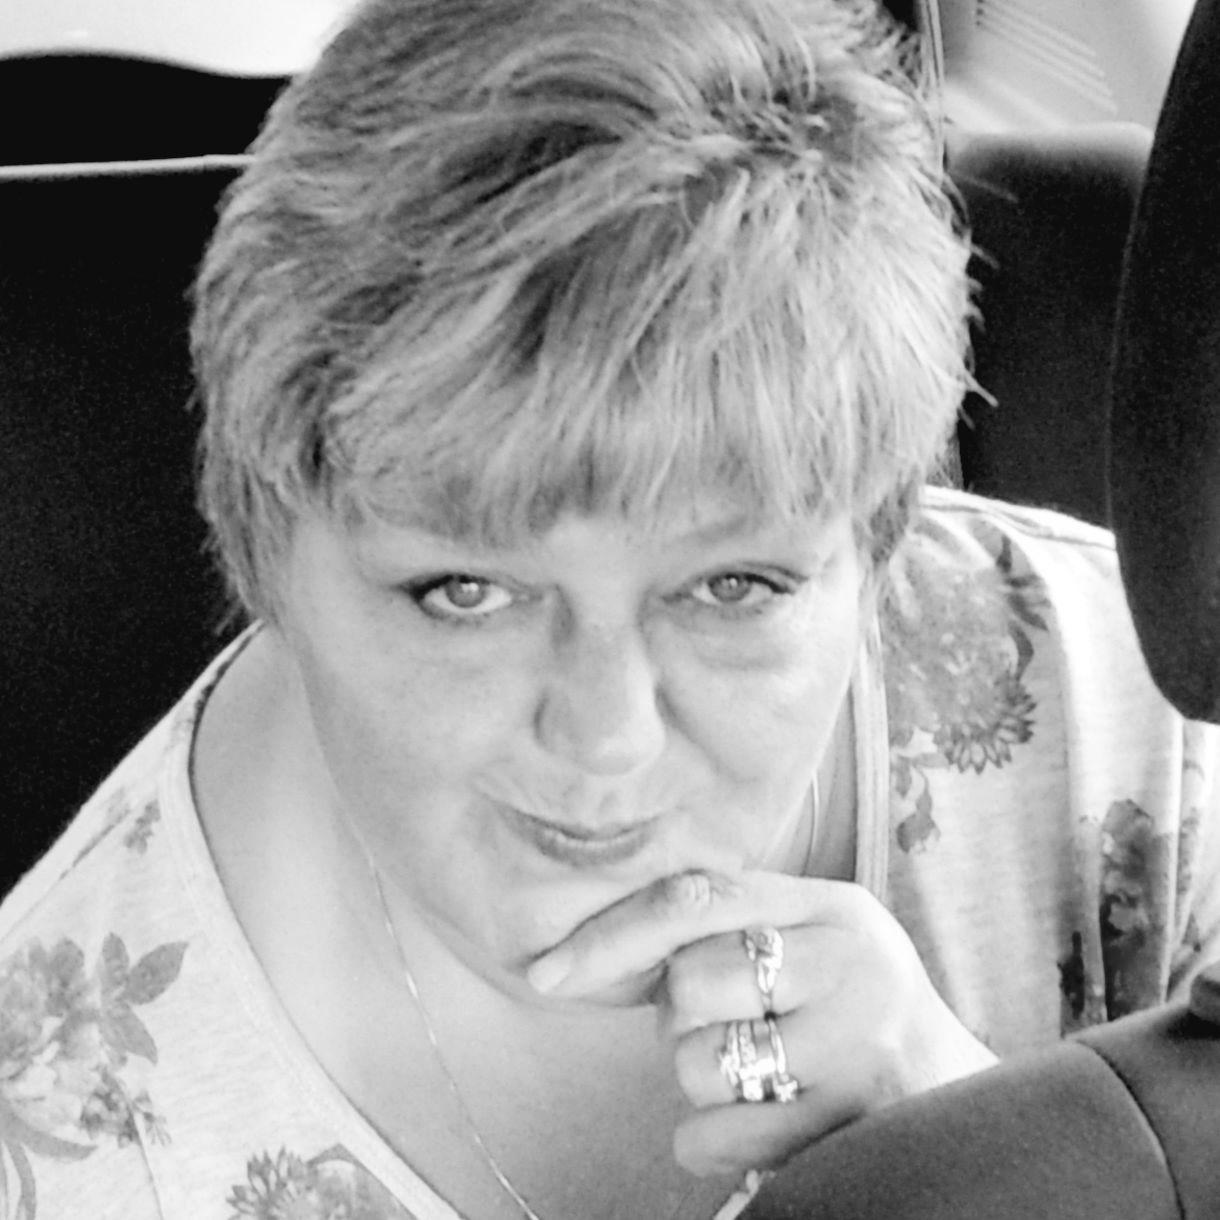 Sherri Lynn Bango, 51, of Harrisville